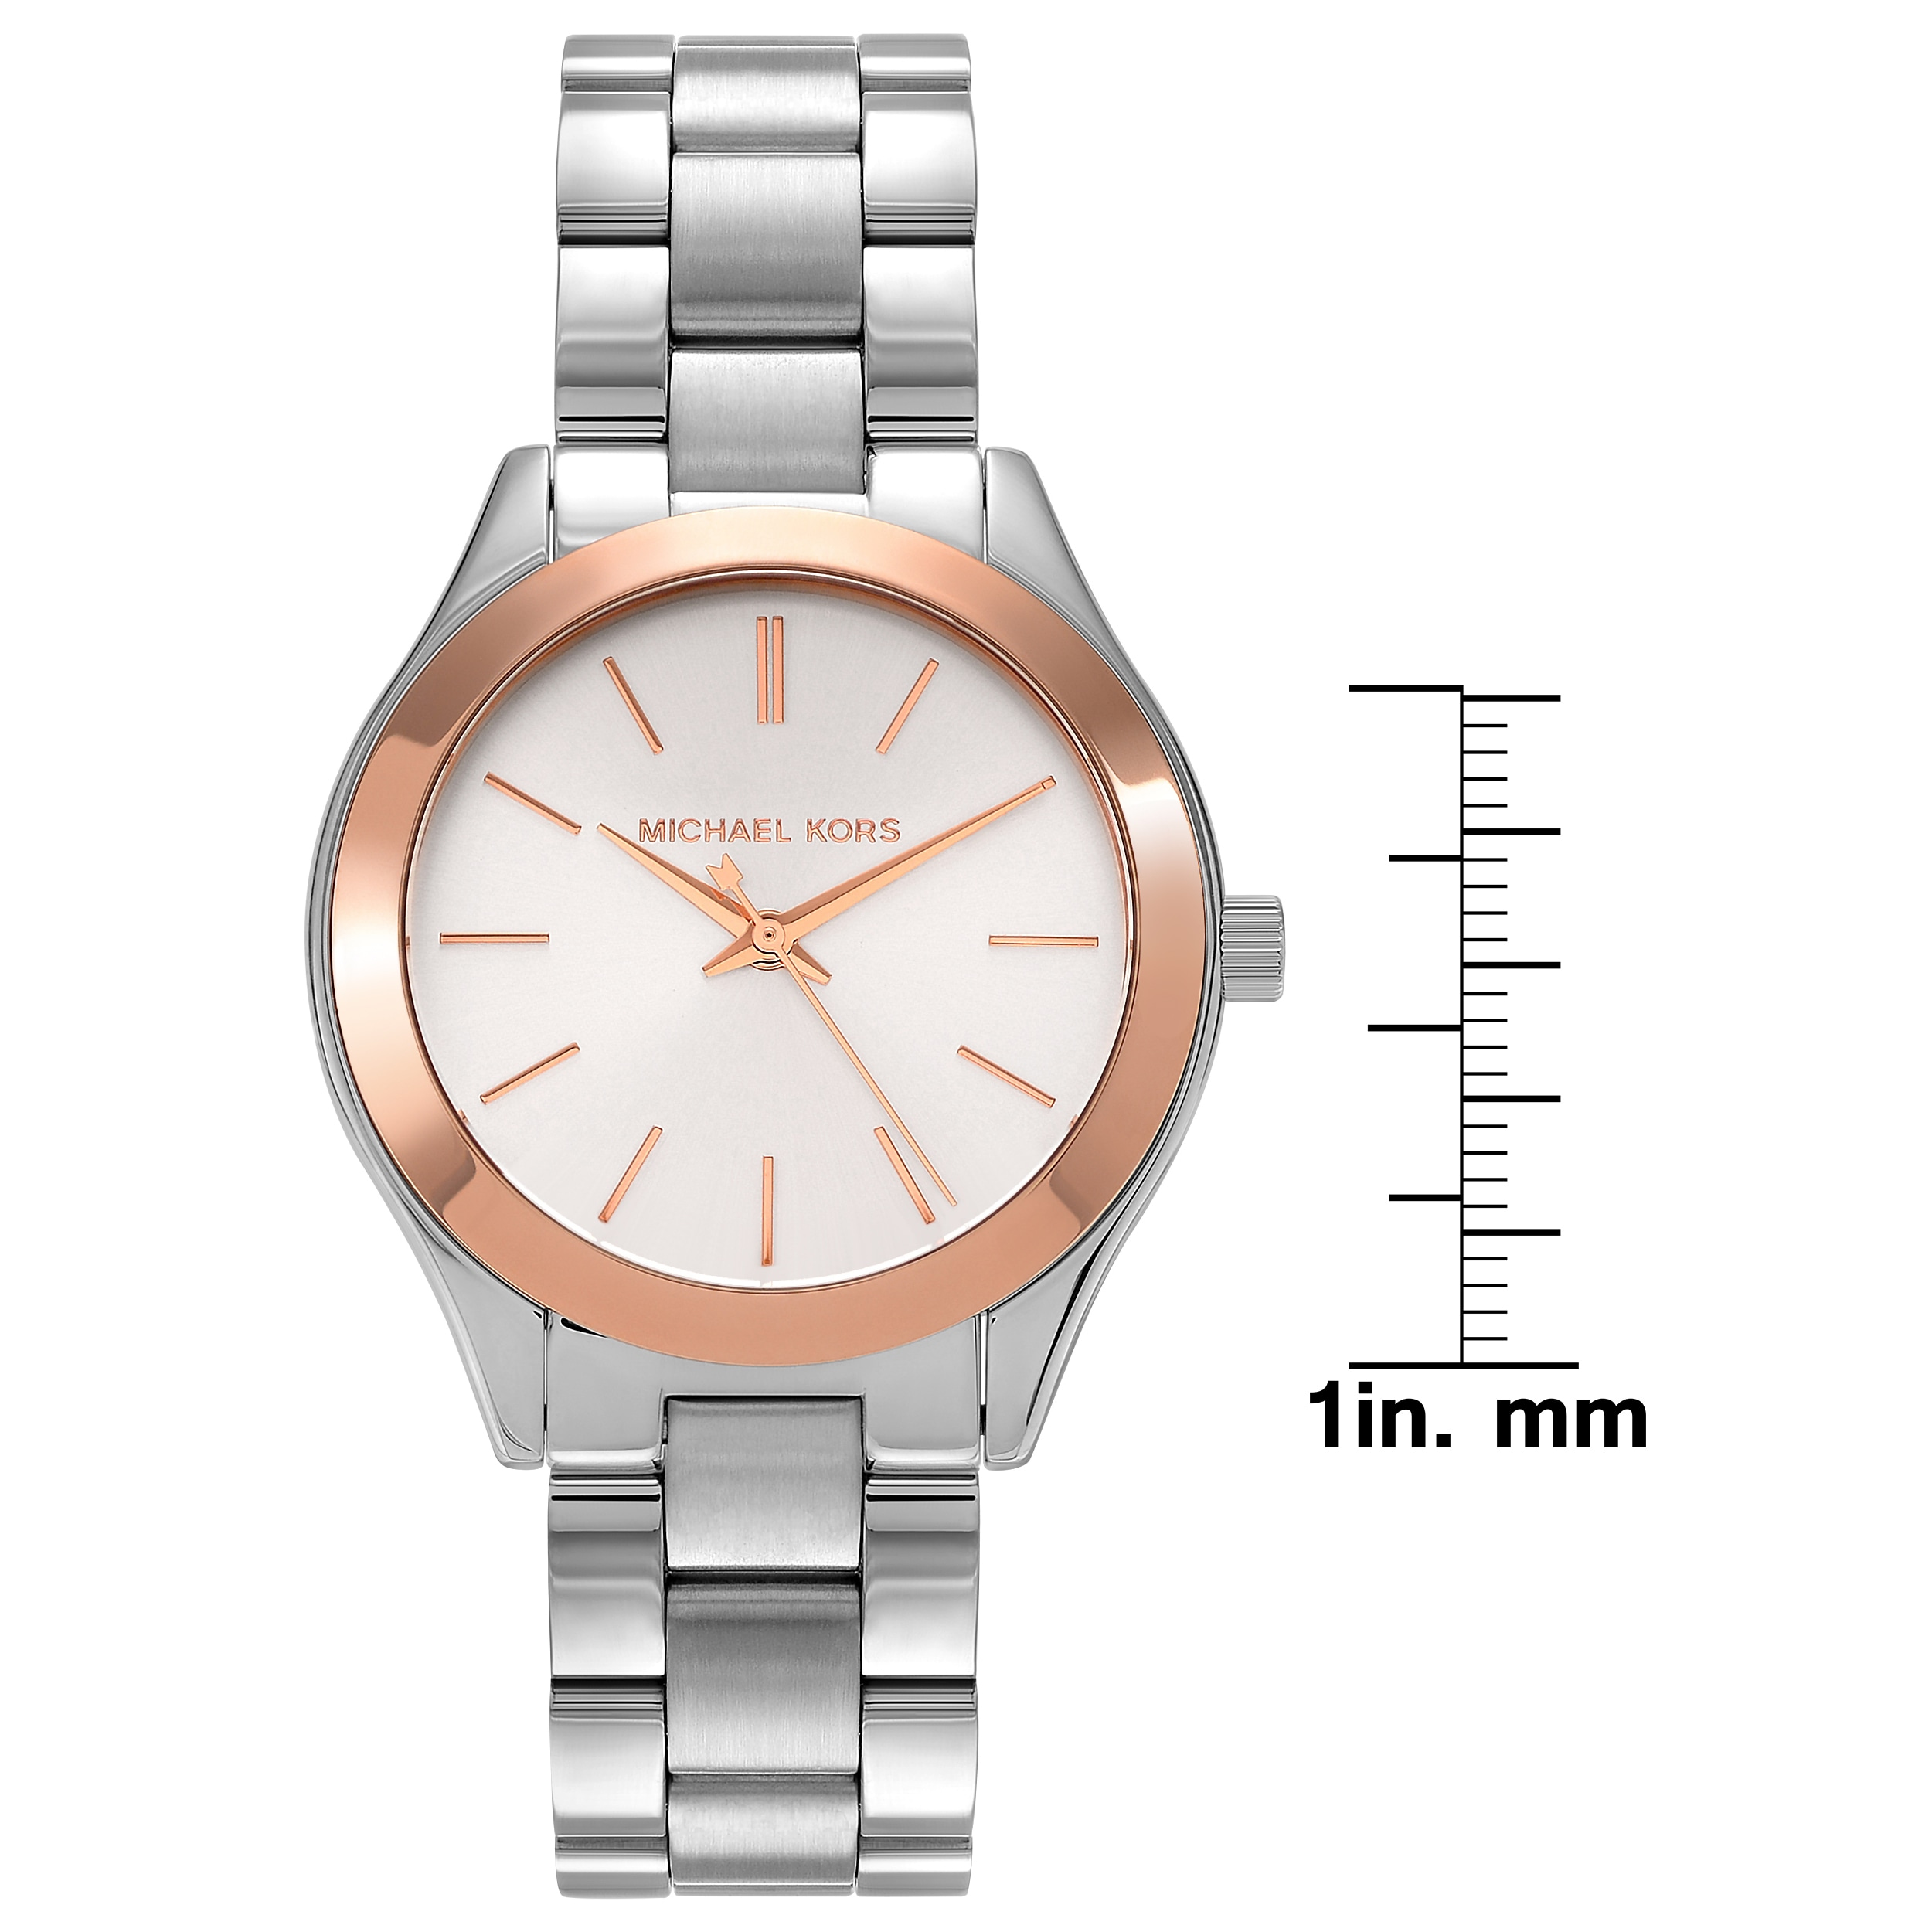 b708e67048d Shop Michael Kors Women s MK3514  Mini Slim Runway  Stainless Steel Watch - Free  Shipping Today - Overstock - 11903605